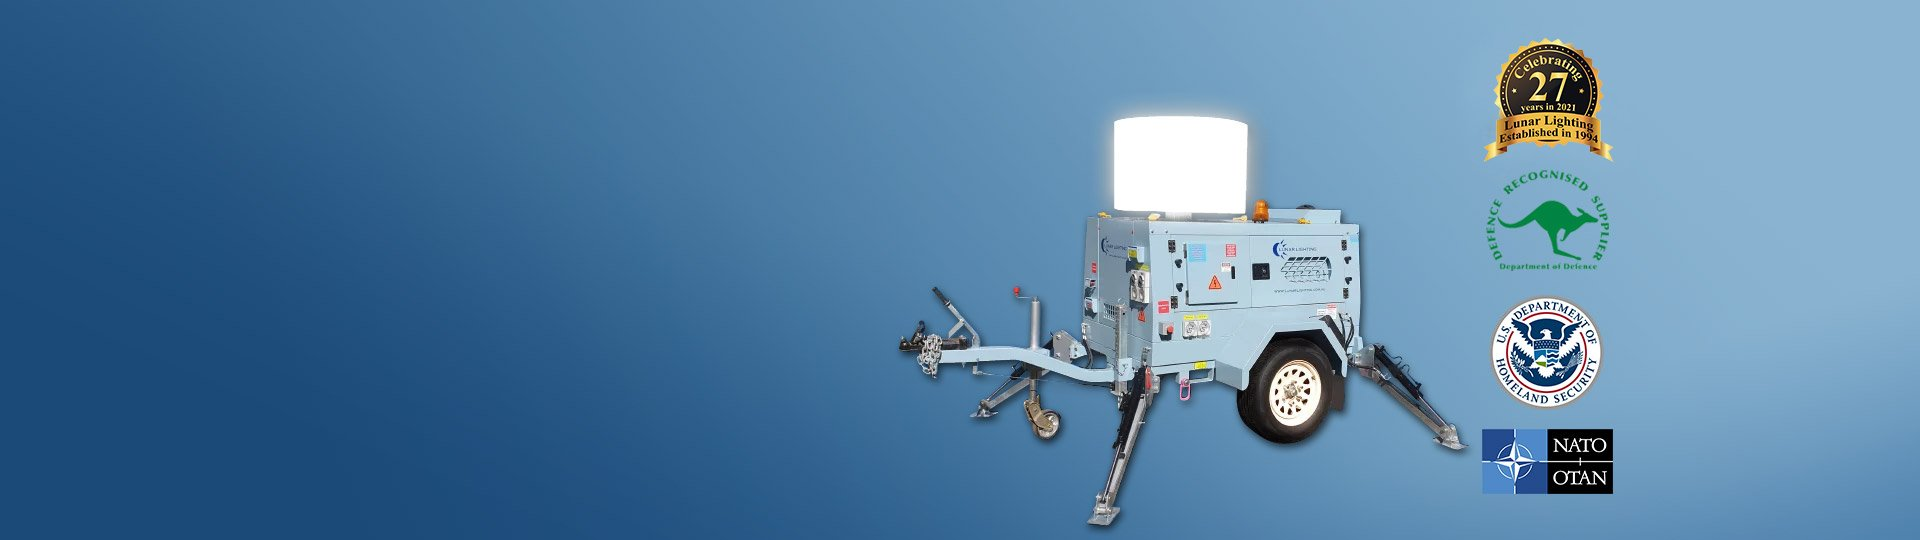 4800W LED Lunar Light Tower